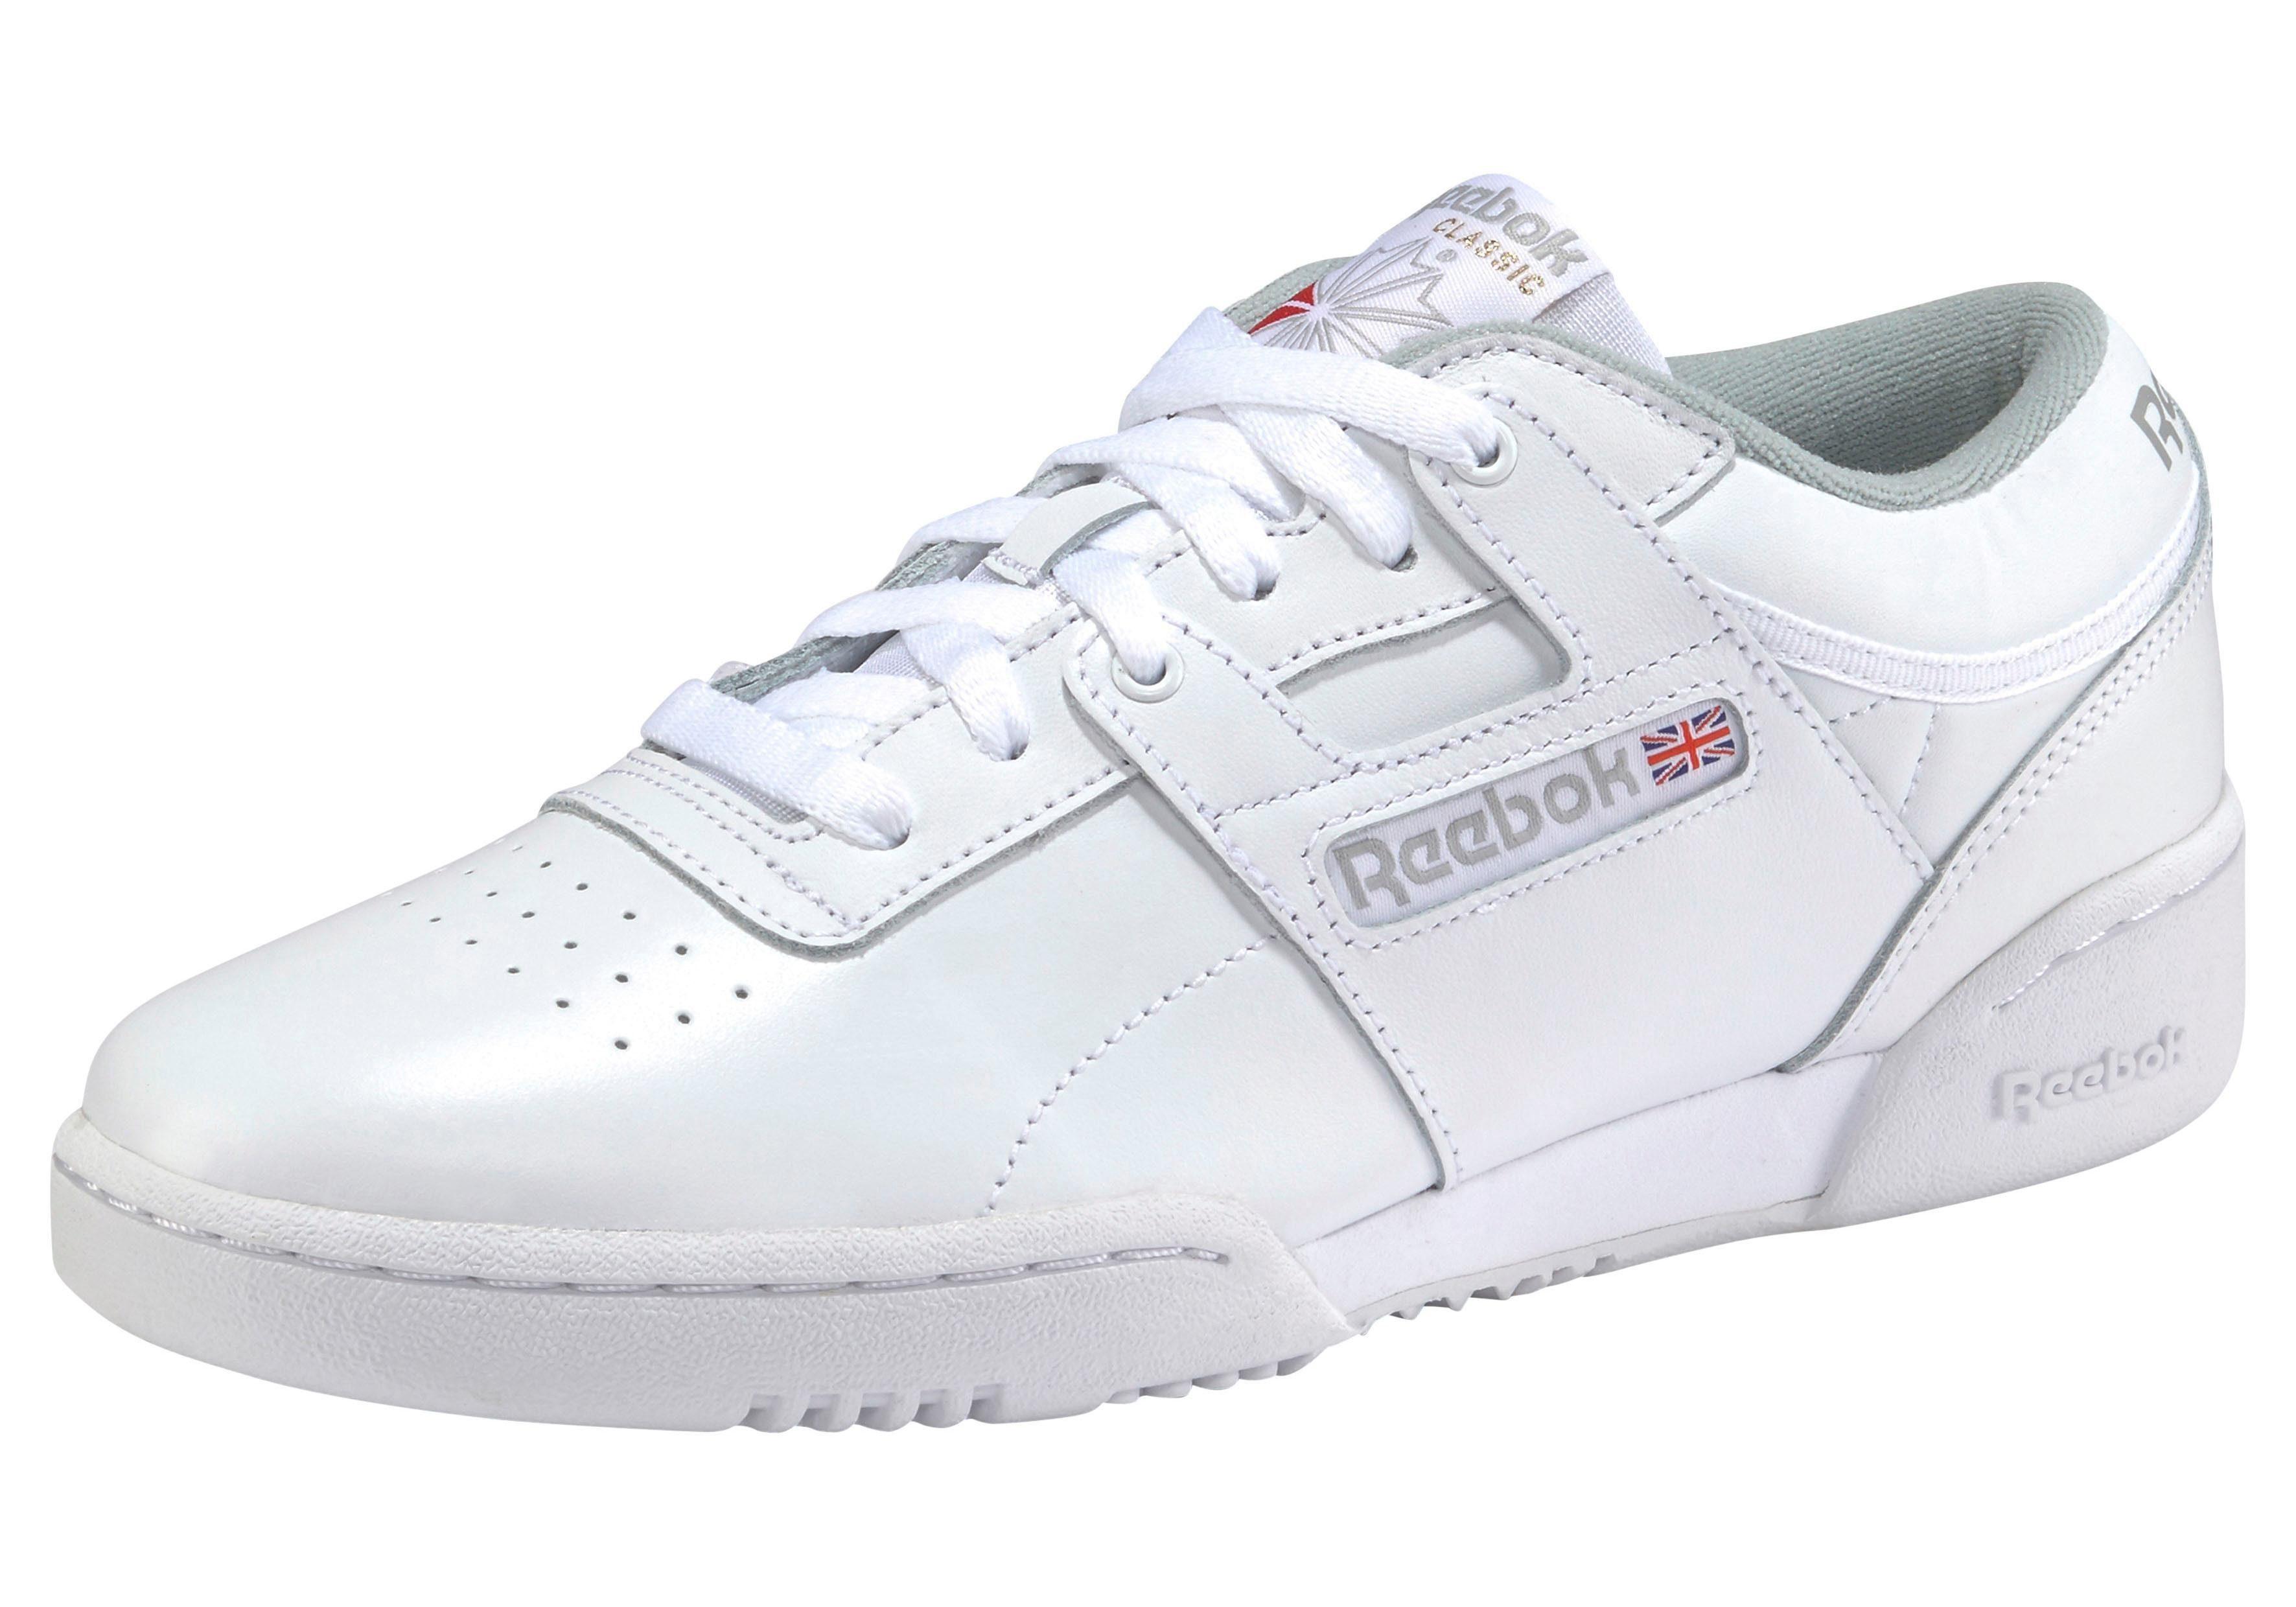 Reebok Classic »Workout Low« Sneaker, Sportlicher Sneaker von Reebok online kaufen | OTTO